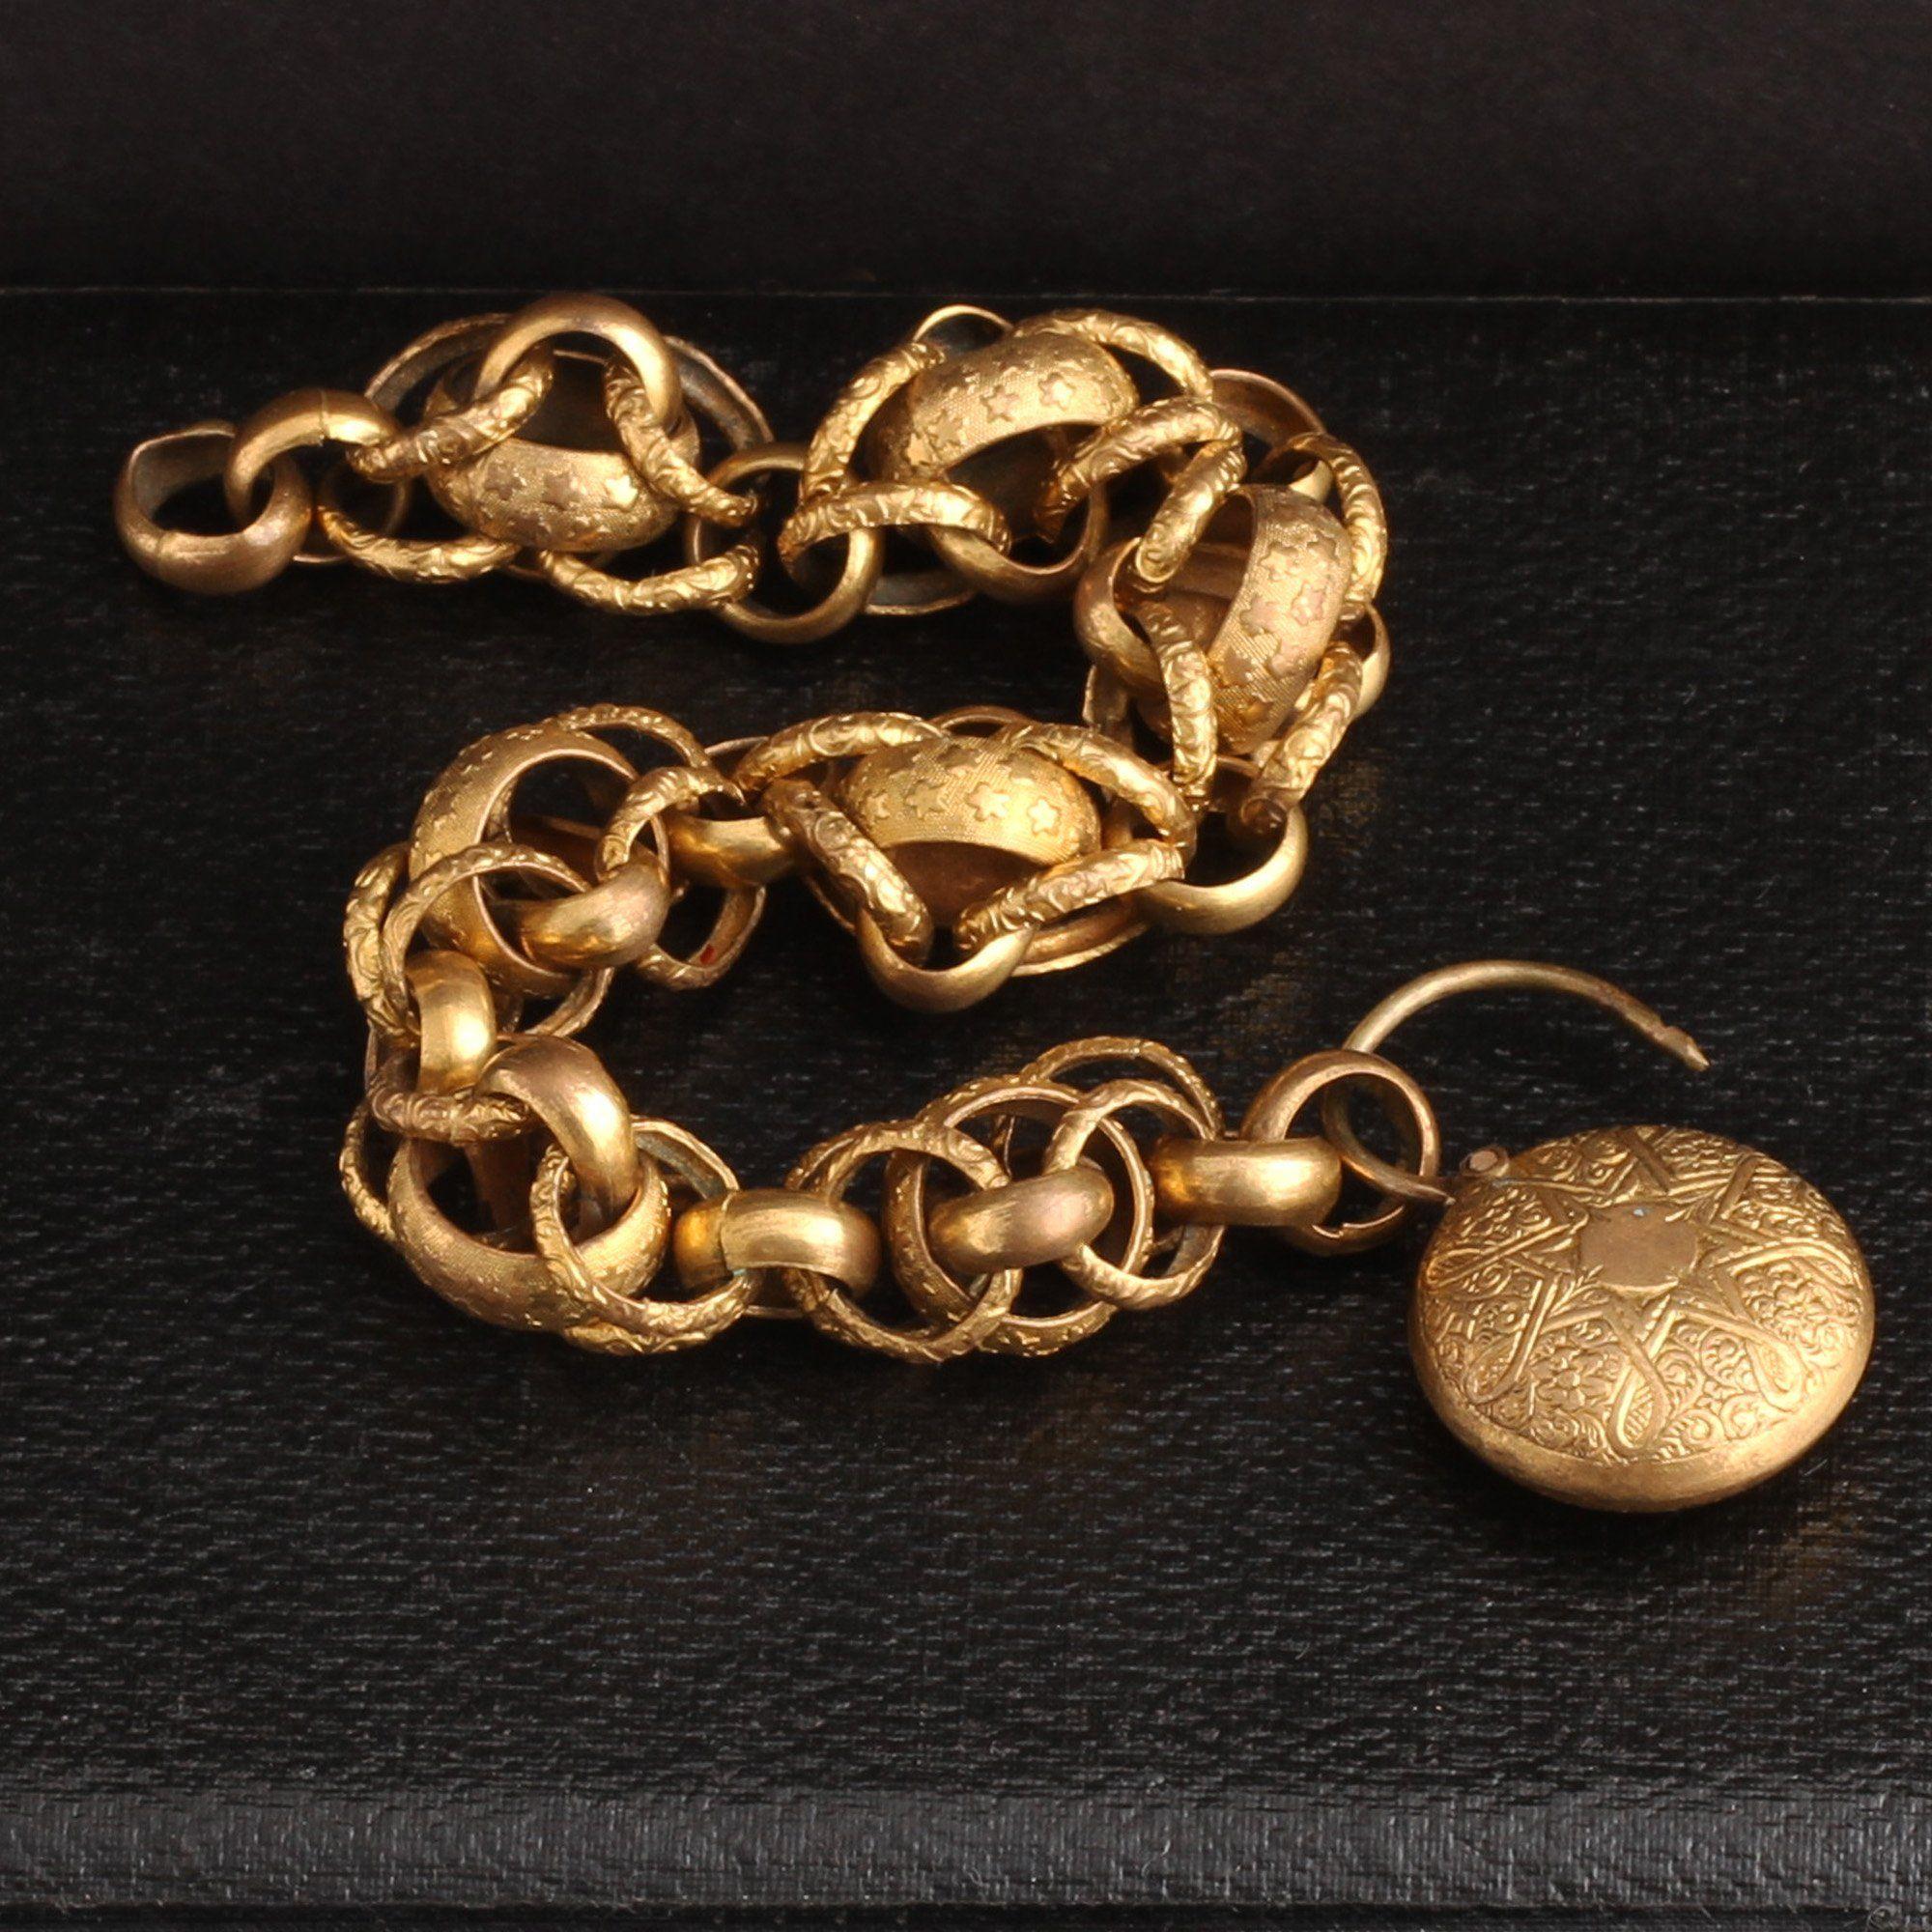 Georgian Pinchbeck Fancy Link Chain Bracelet with Padlock